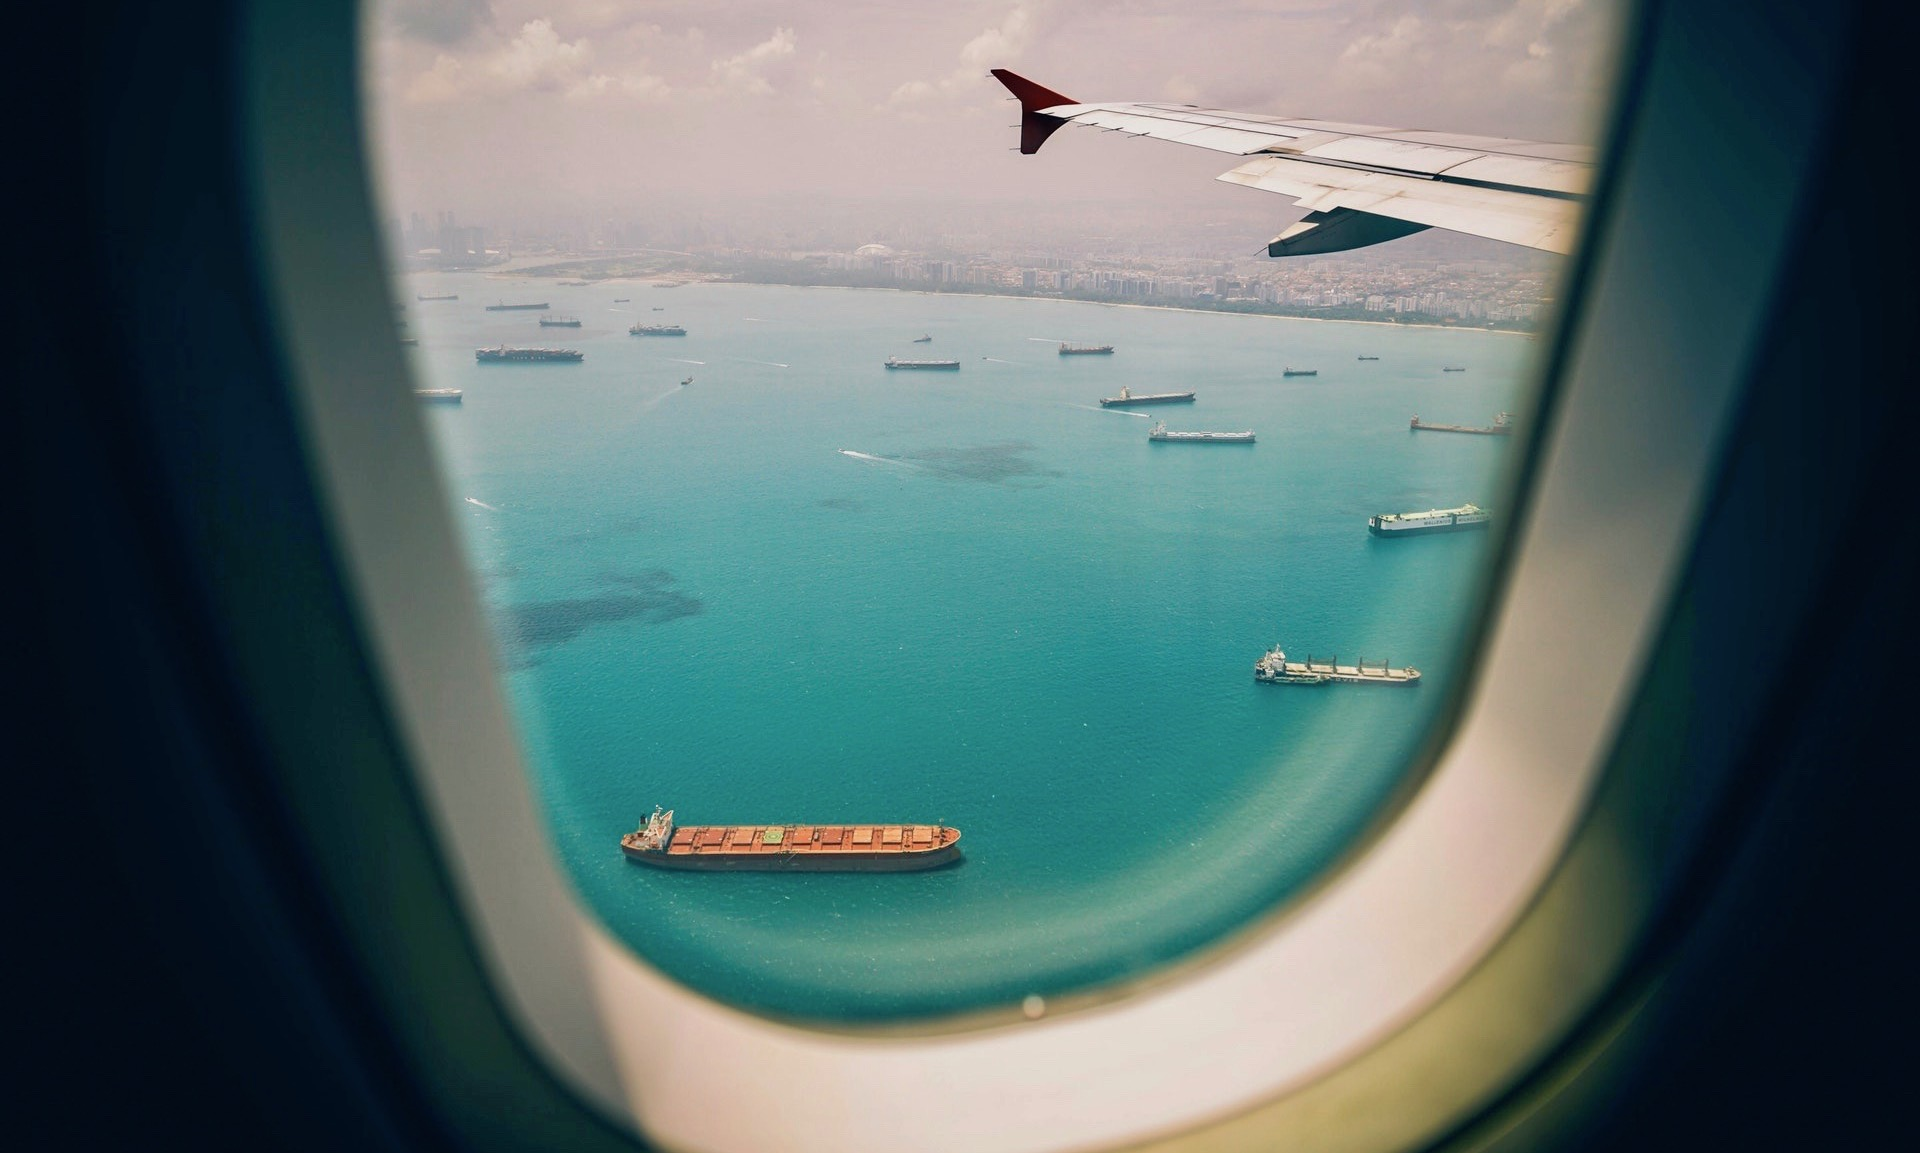 Flightnook - Will Sustainability Fly_red